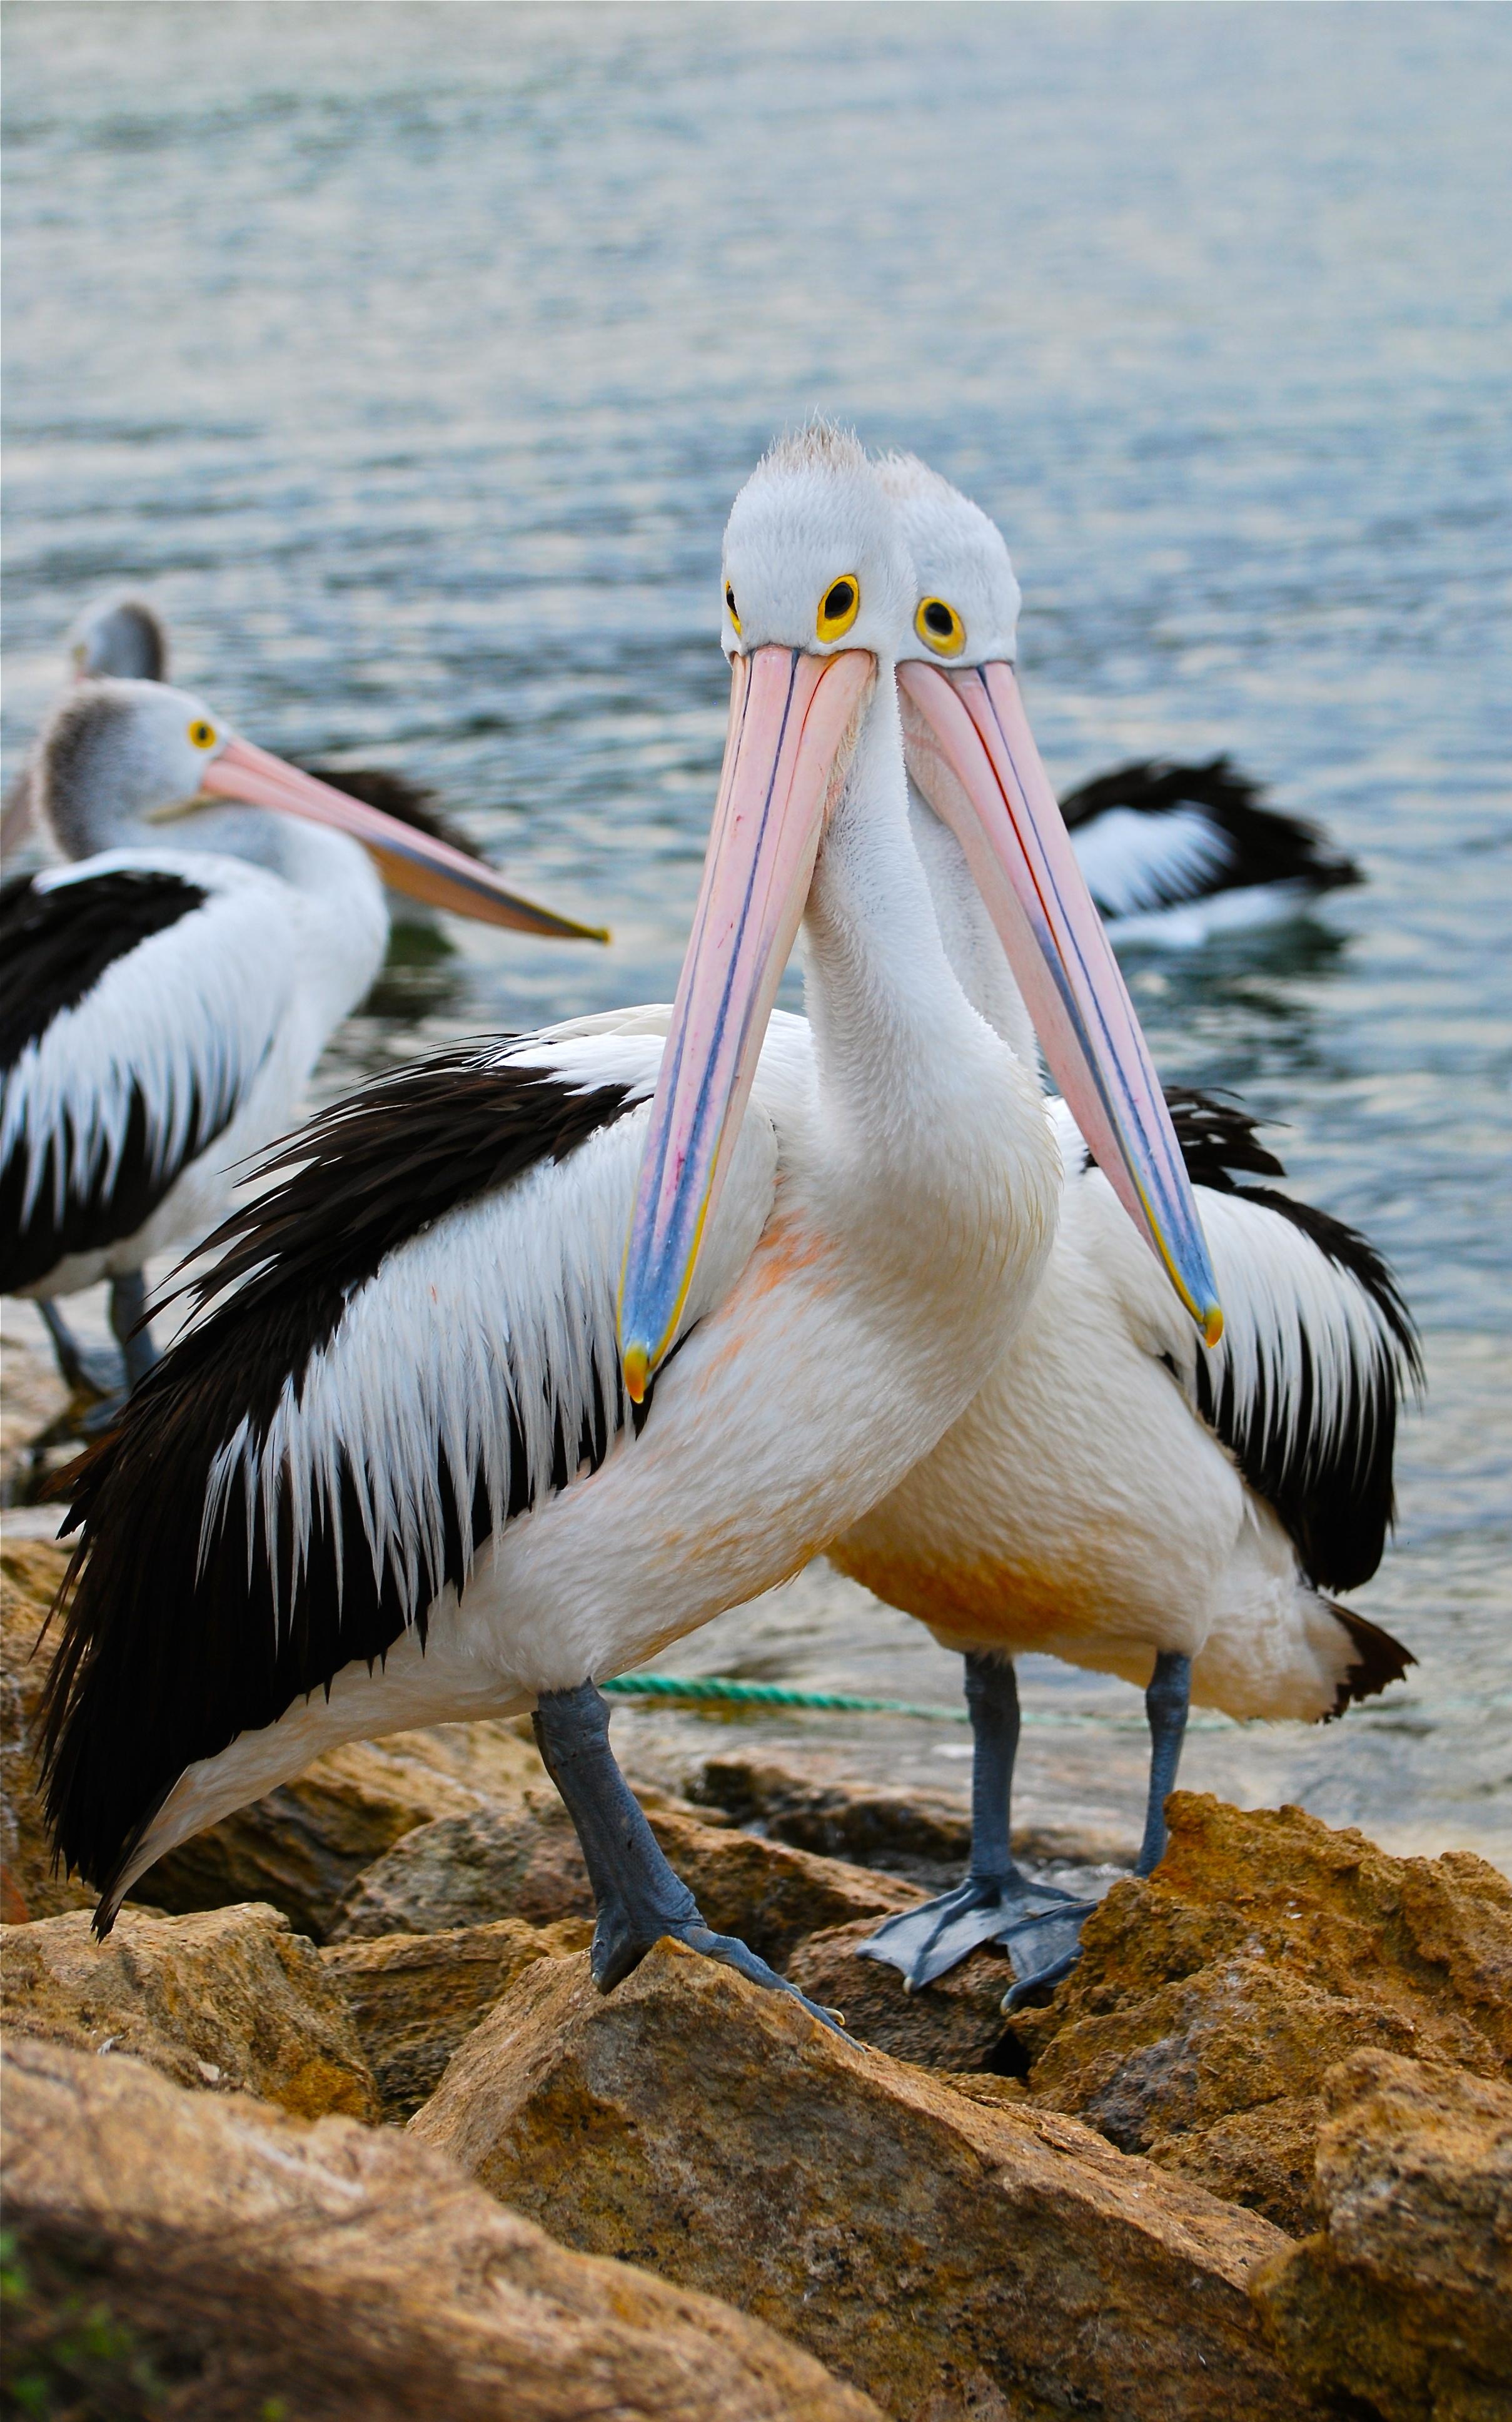 d pelicans on Kangaroo Island, Australia